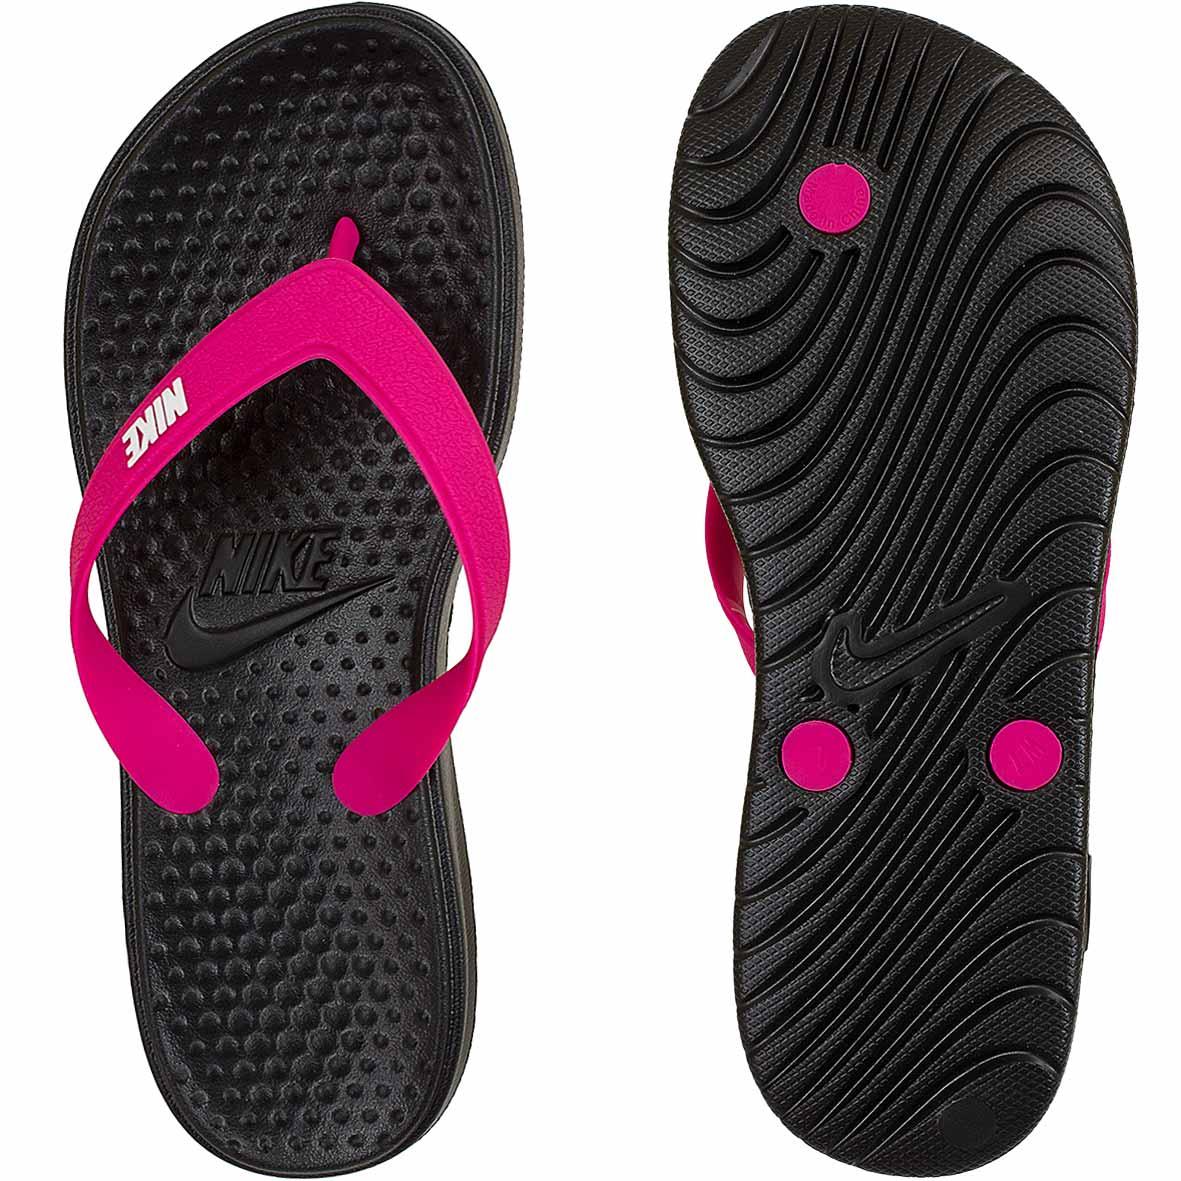 ☆ Nike Damen Flip-Flops Solay Thong schwarz pink - hier bestellen! ee6812fd0c